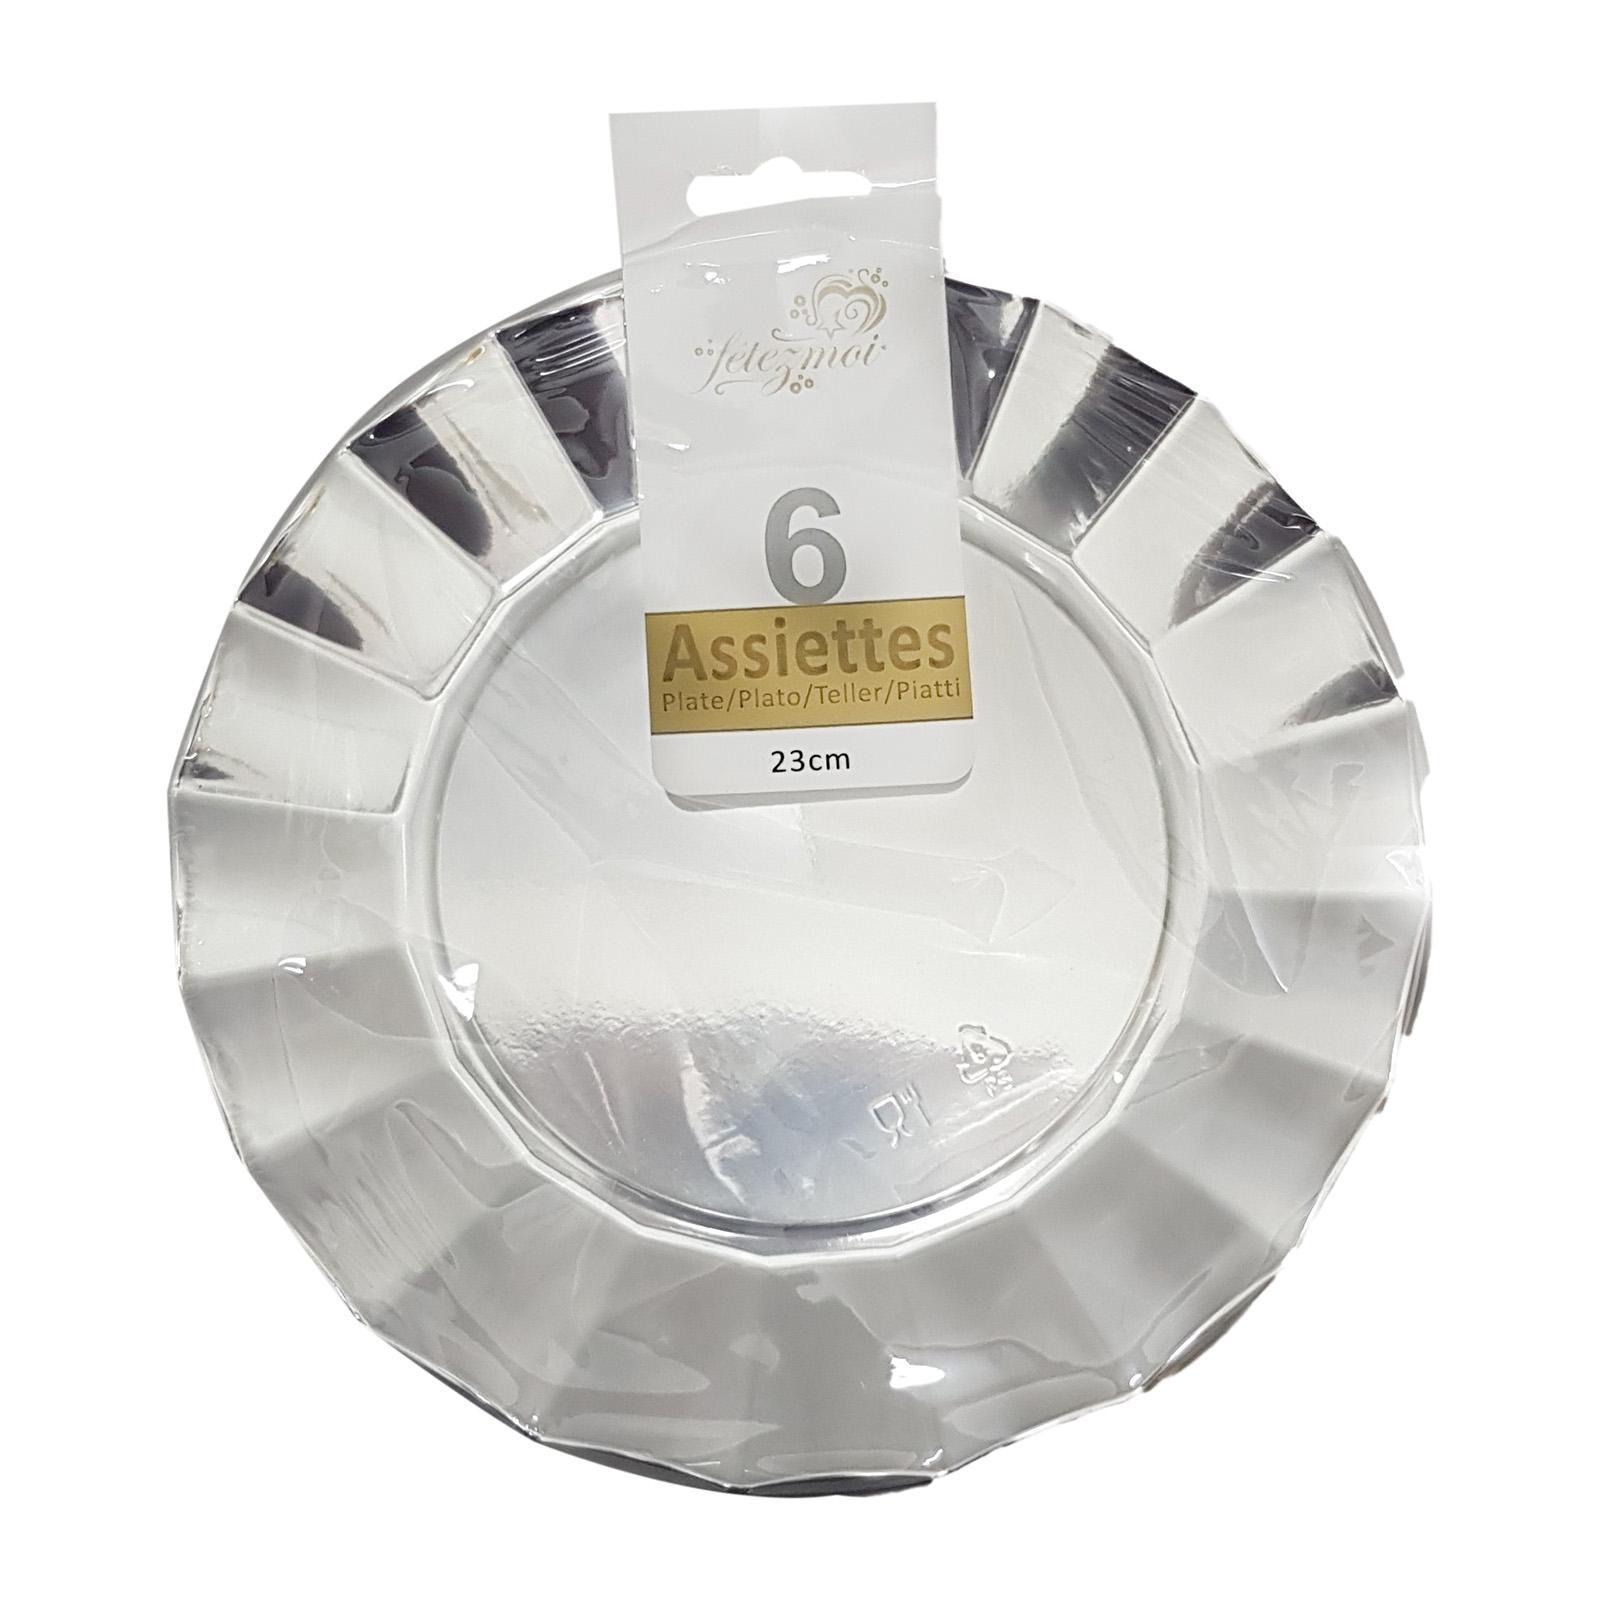 CGS 23cm Silver Round Plastic Plates (6 PCS)